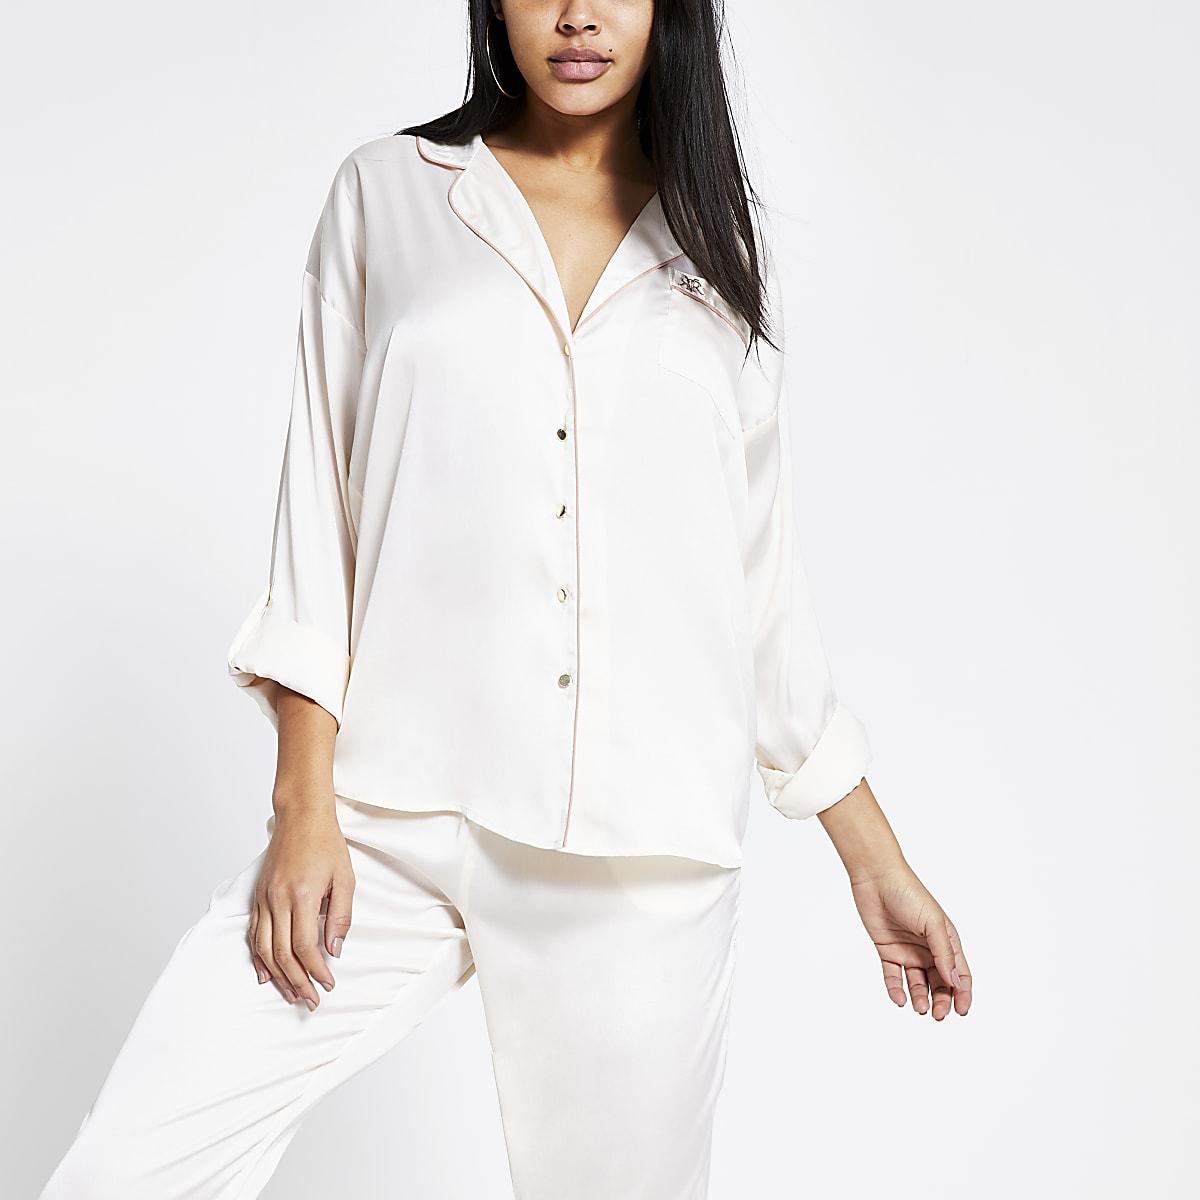 Crème satijnen pyjama shirt met ruime pasvorm